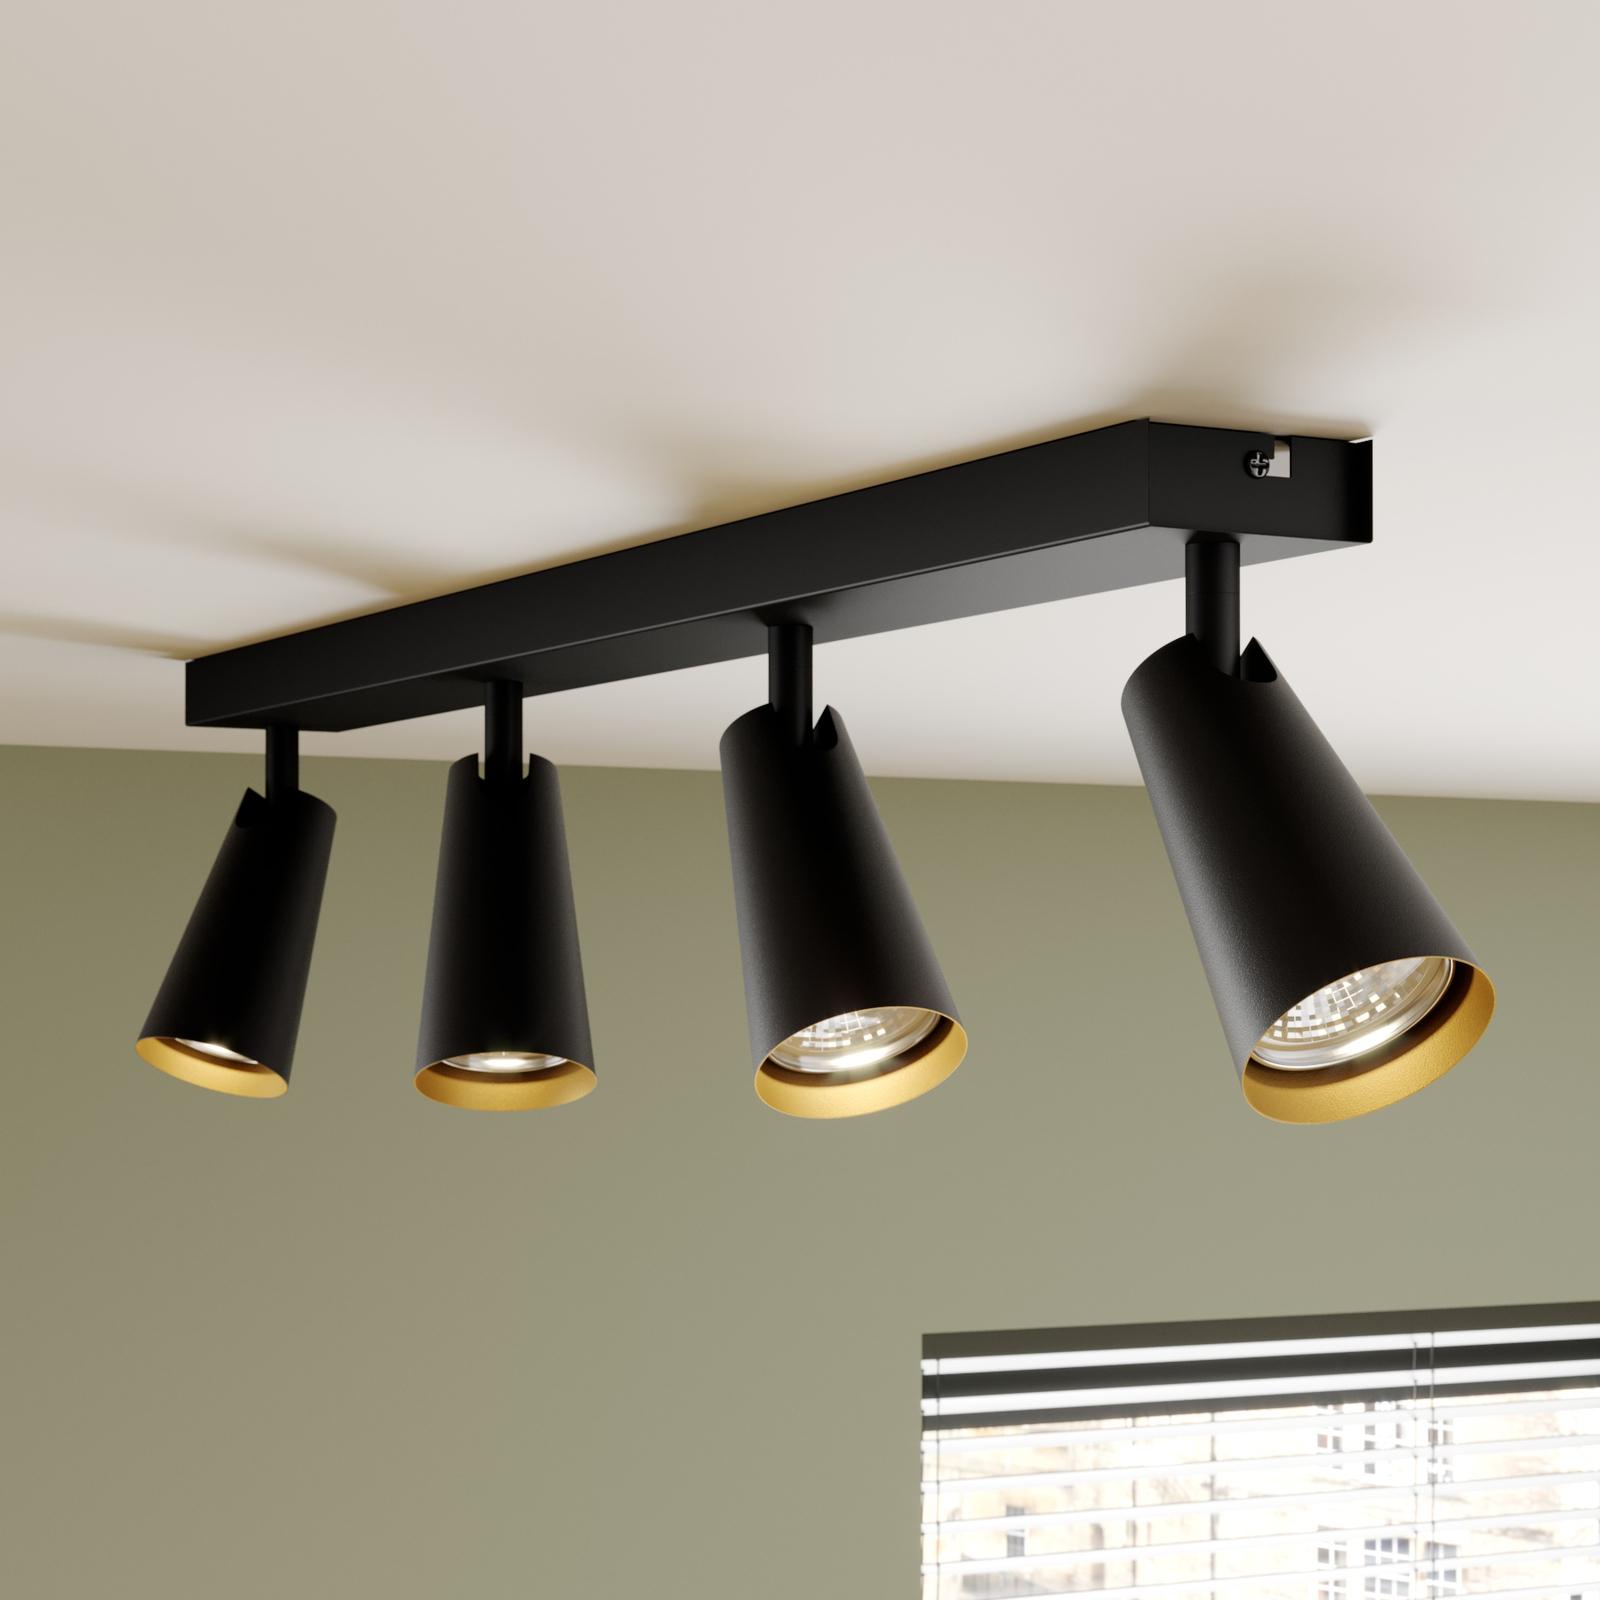 Lucande Angelina taklampe, svart-gull, 4 lyskilder